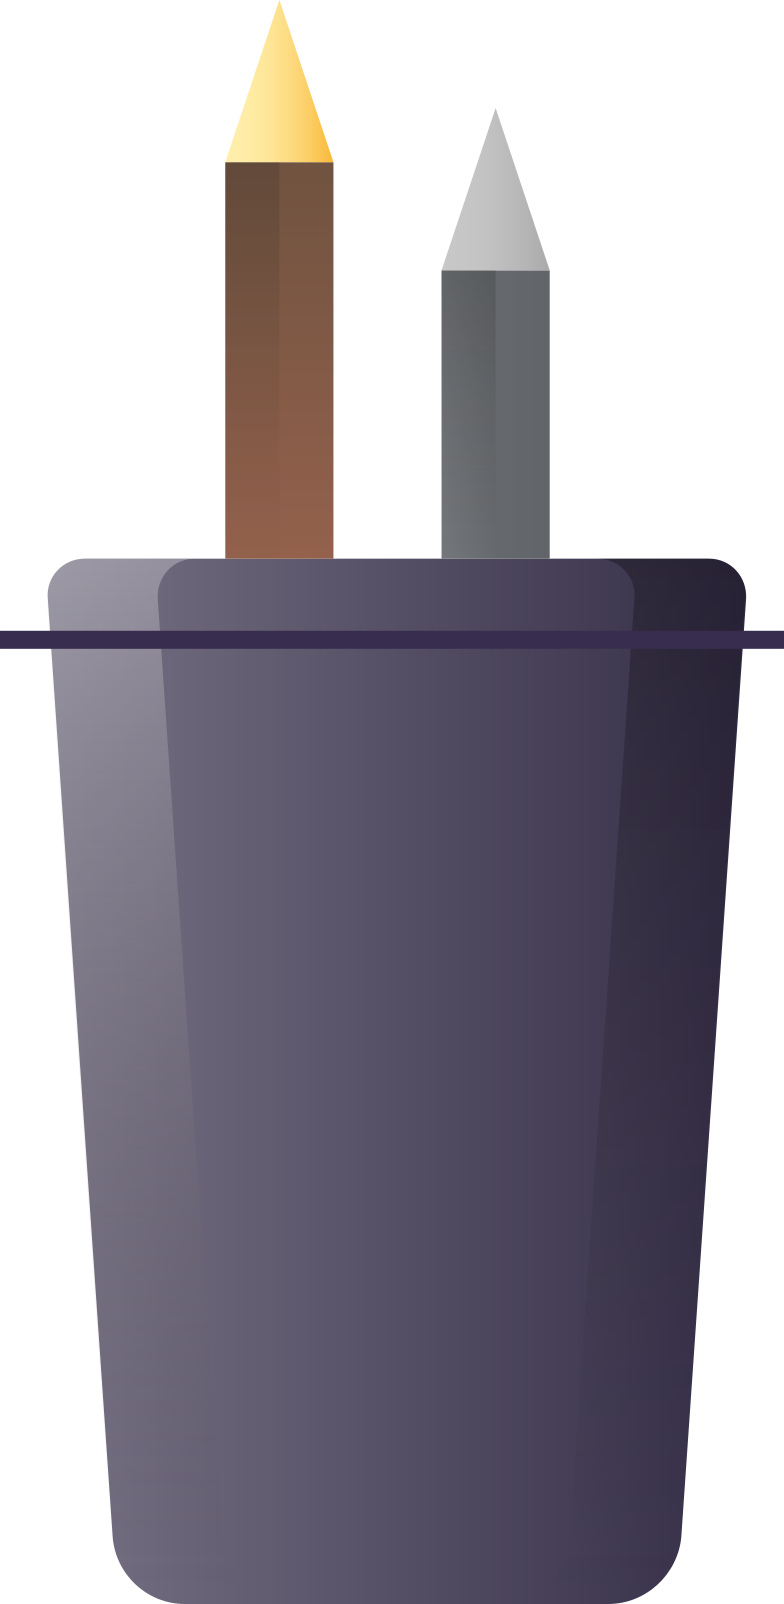 pencil-case Clipart illustration in PNG, SVG